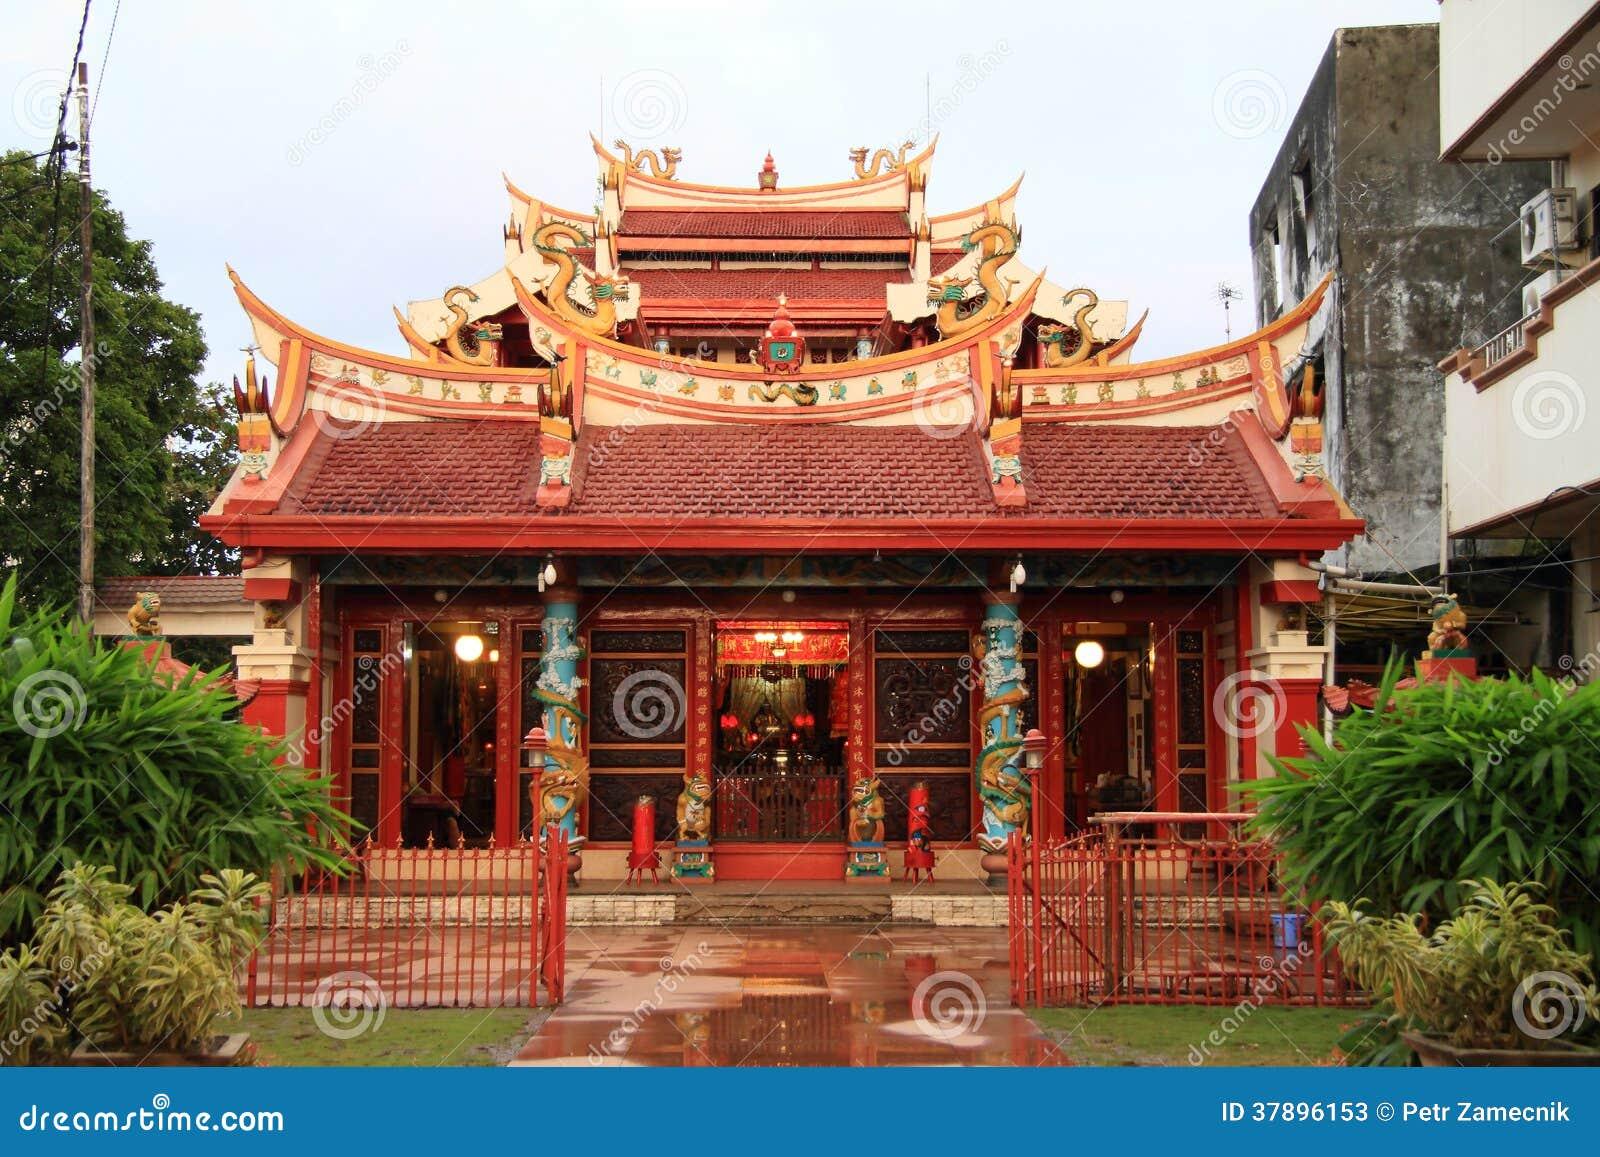 Boeddhistische tempel in Manado